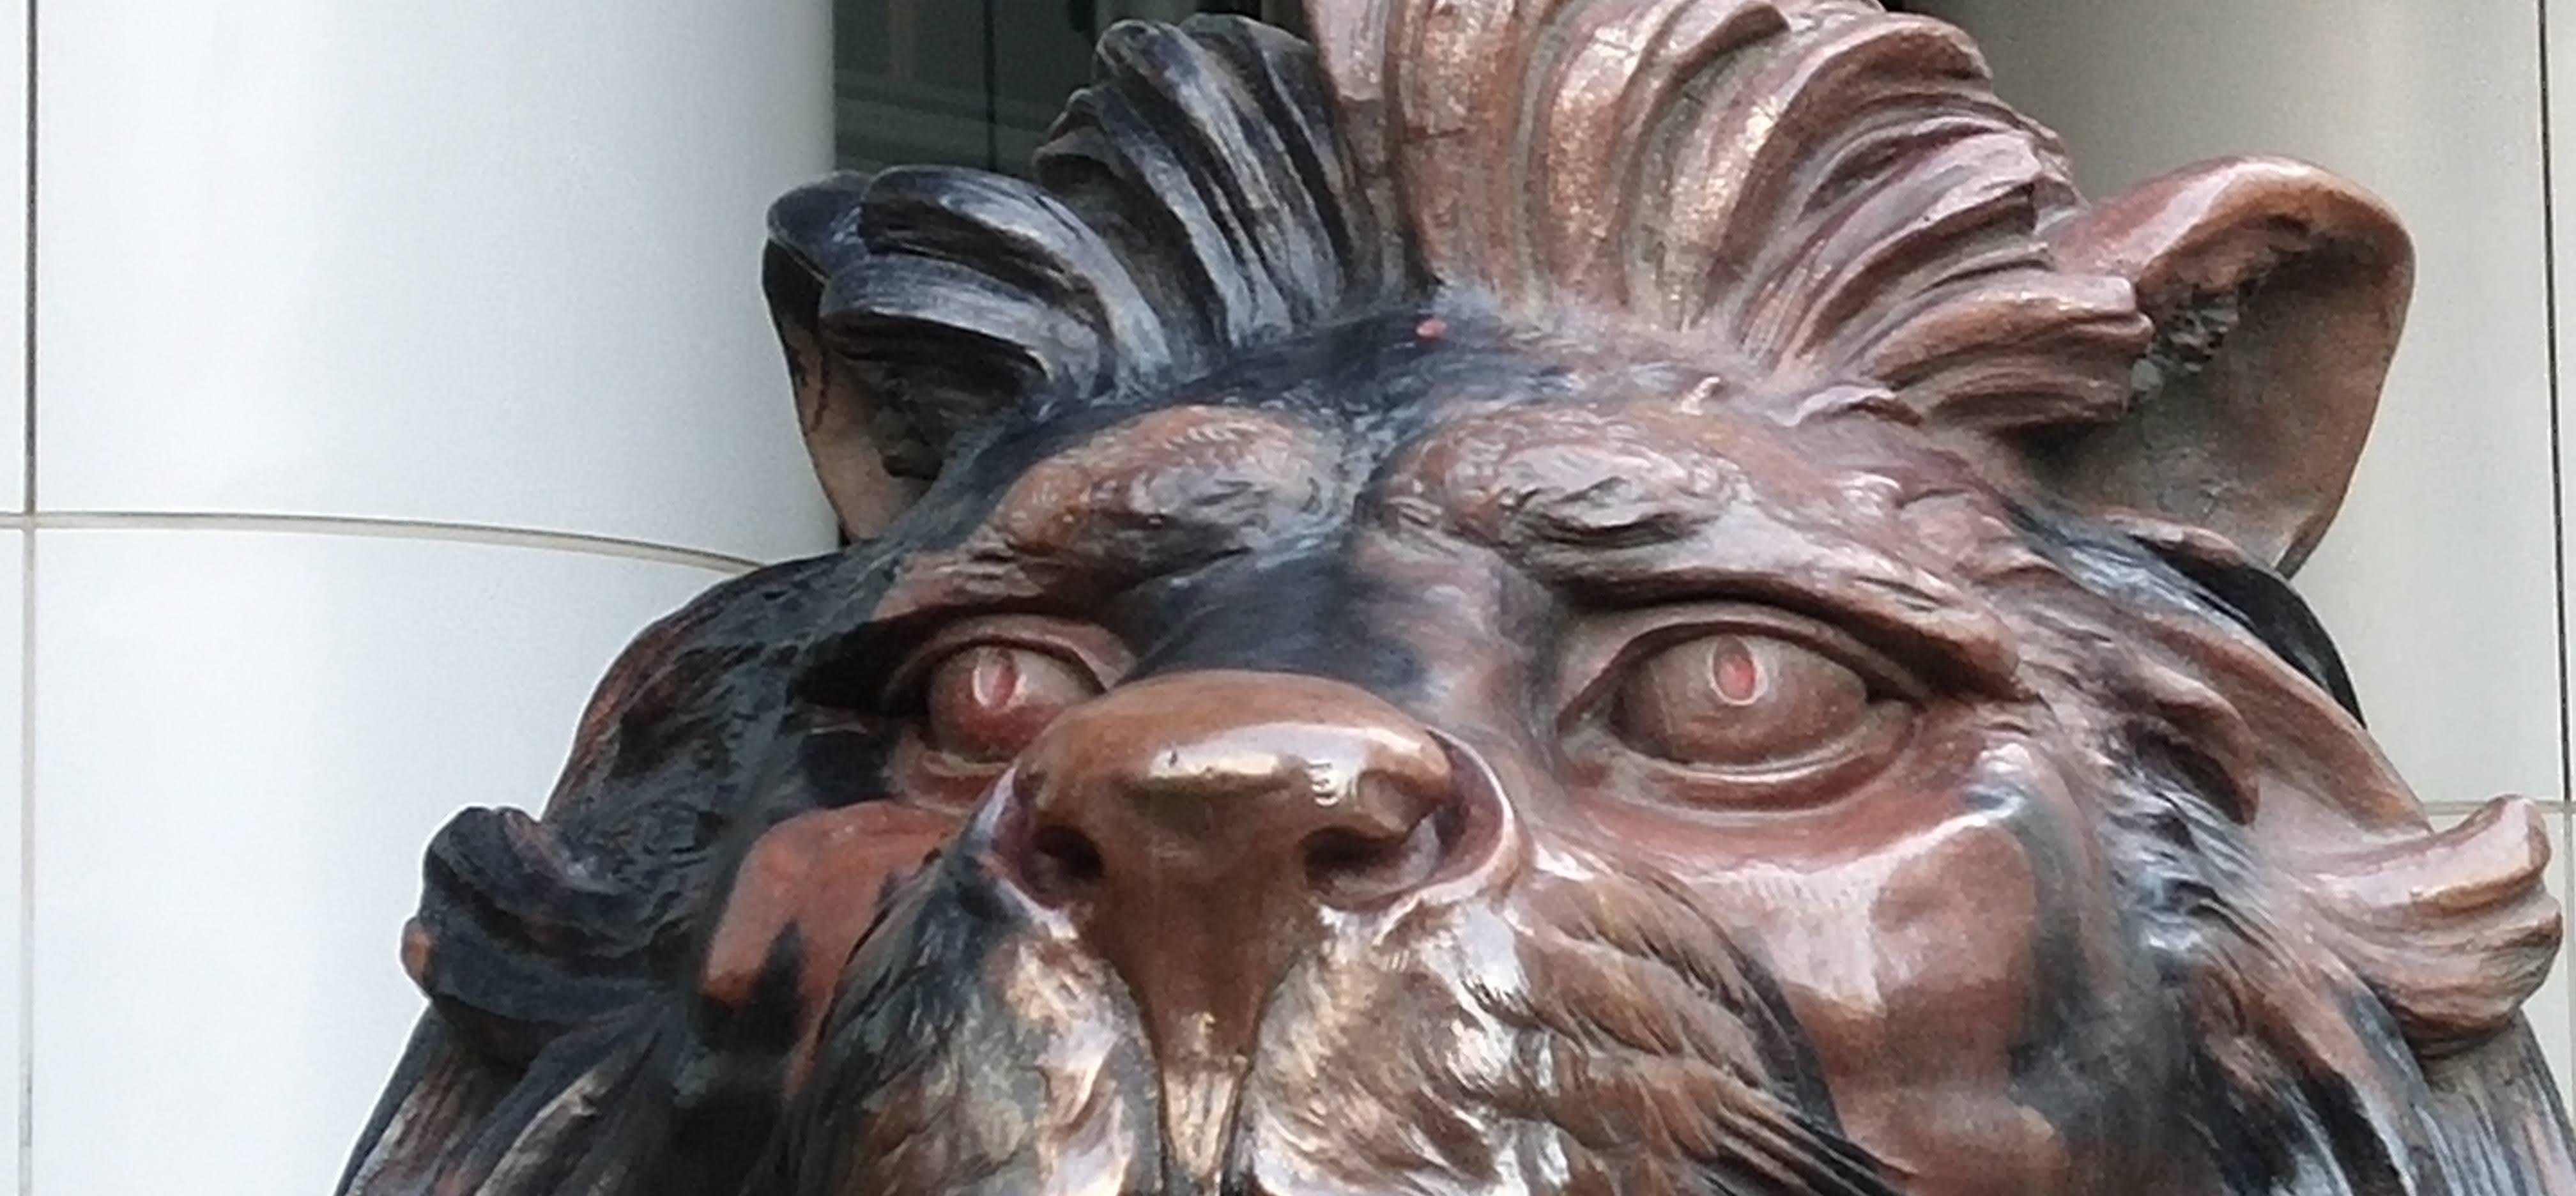 burnt mane of lion statue Stitt of HSBC